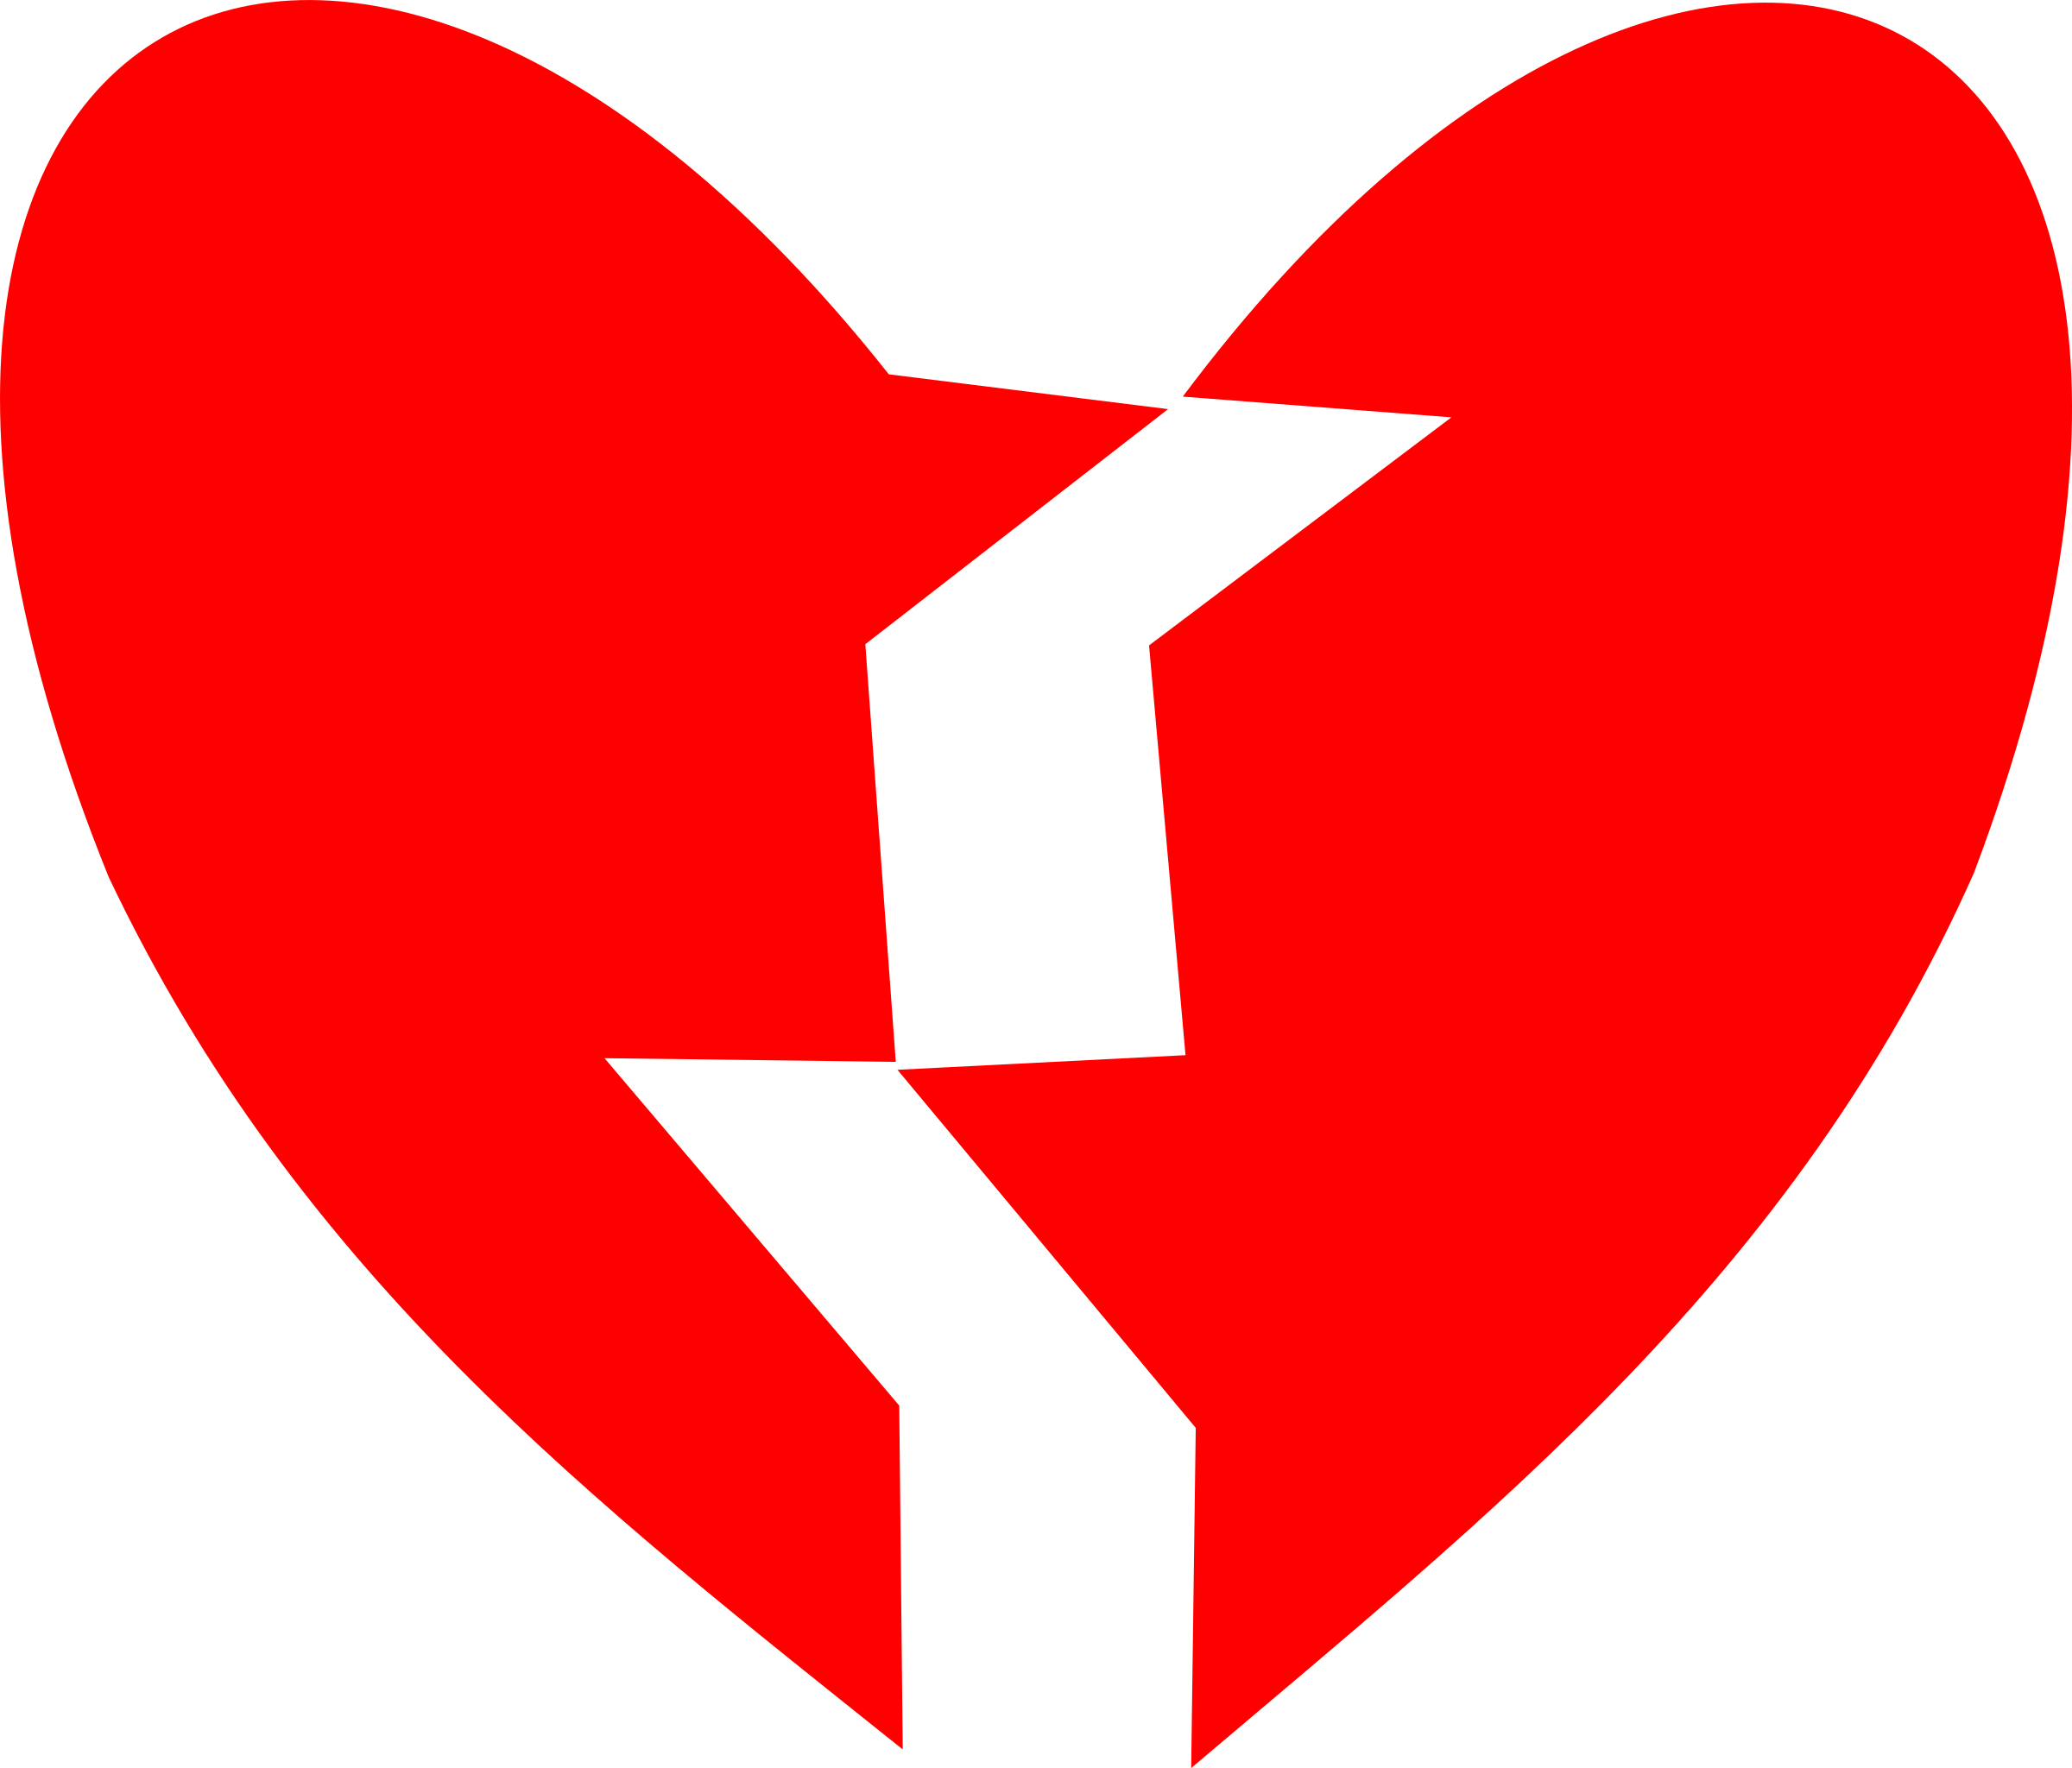 Heart broken clipart clip art freeuse stock Clipart - heart broken clip art freeuse stock